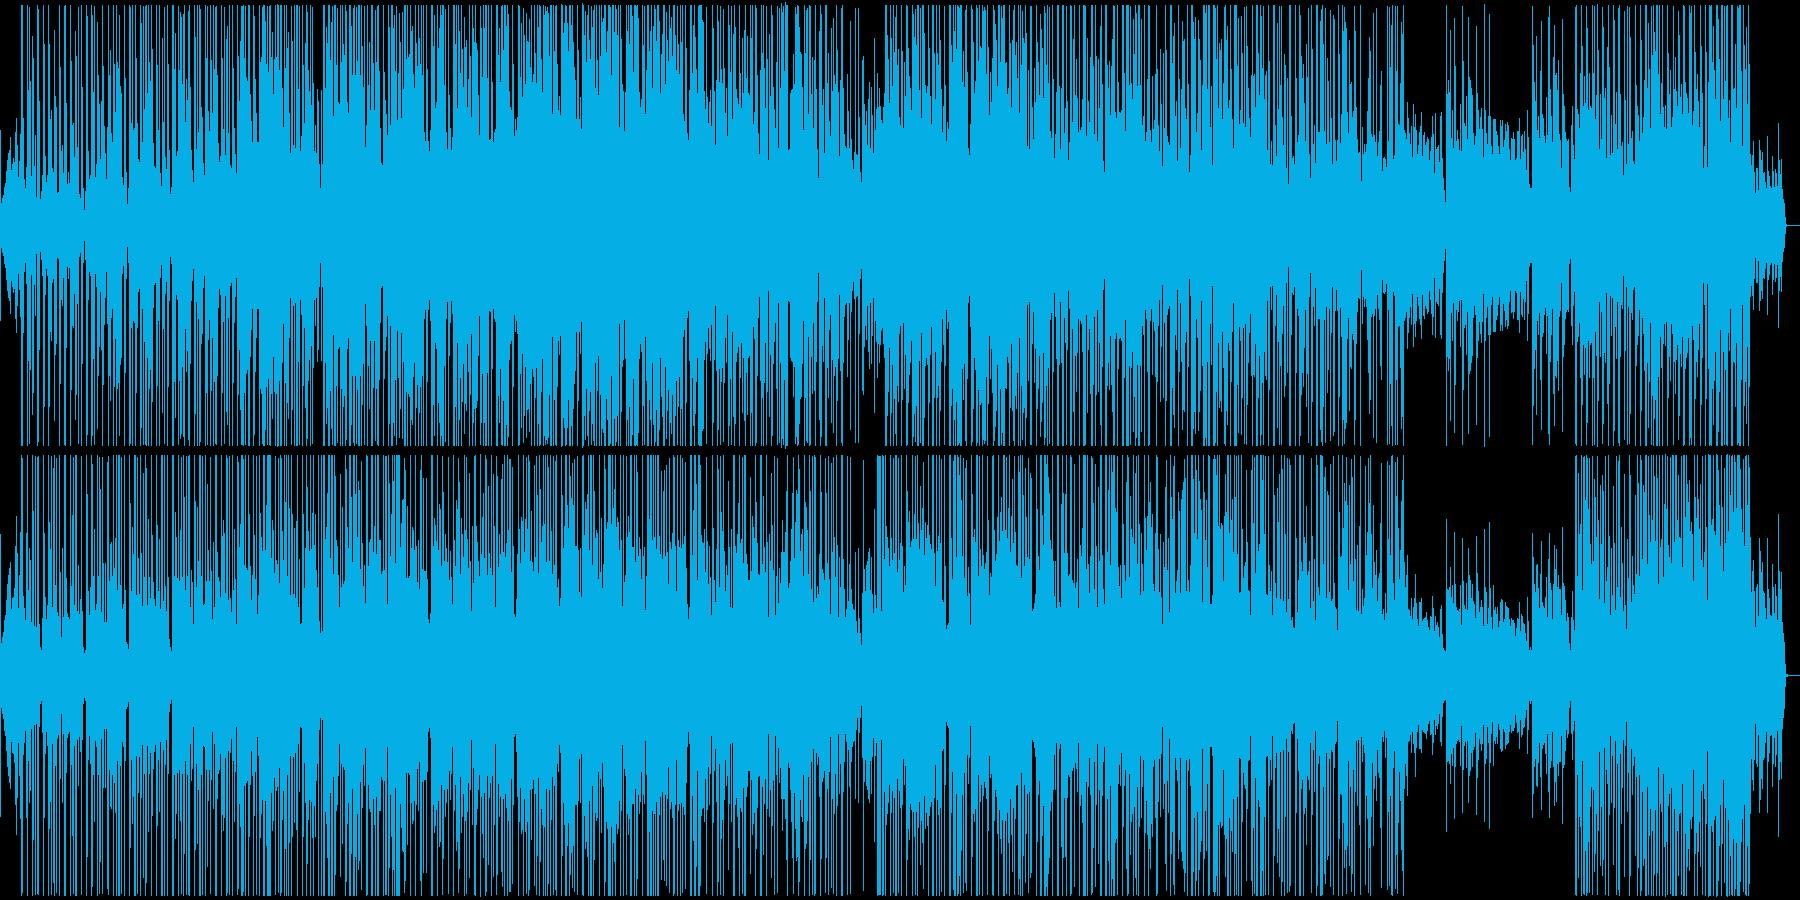 Grasshoppersの再生済みの波形